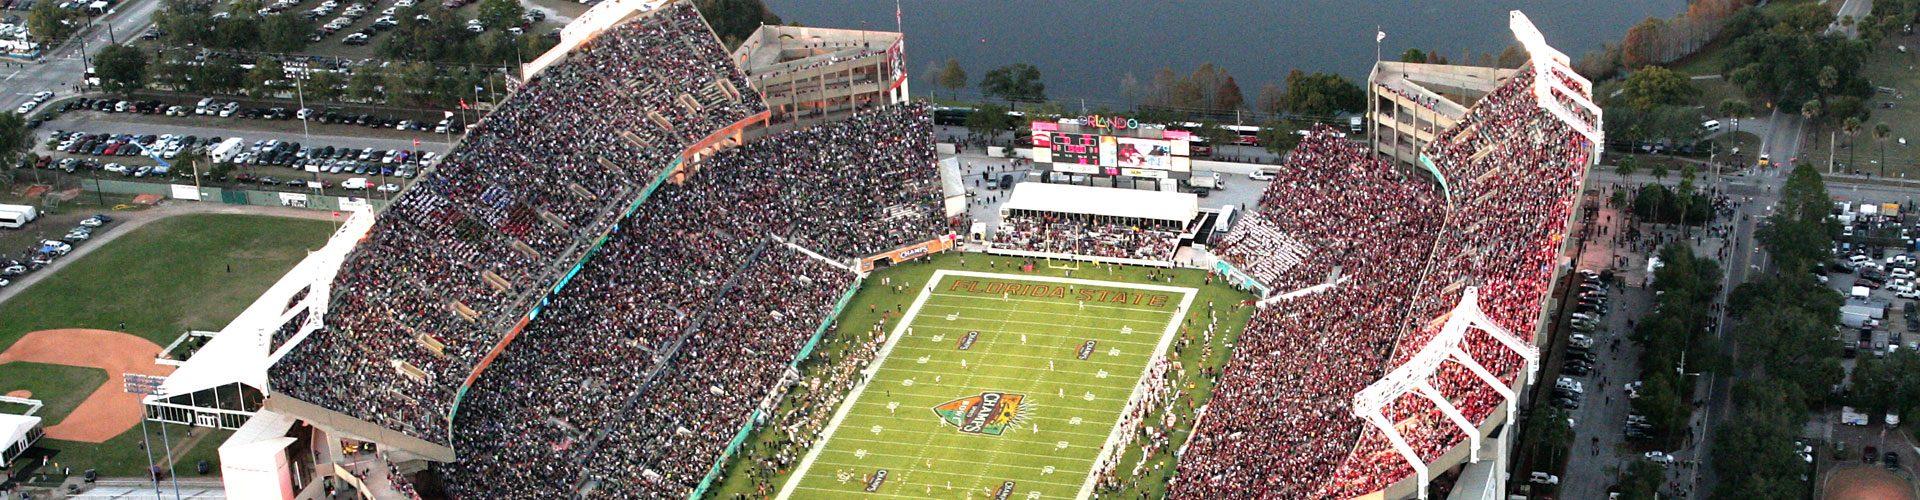 ESPN Wide World of Sports Complex, Olrando, Florida